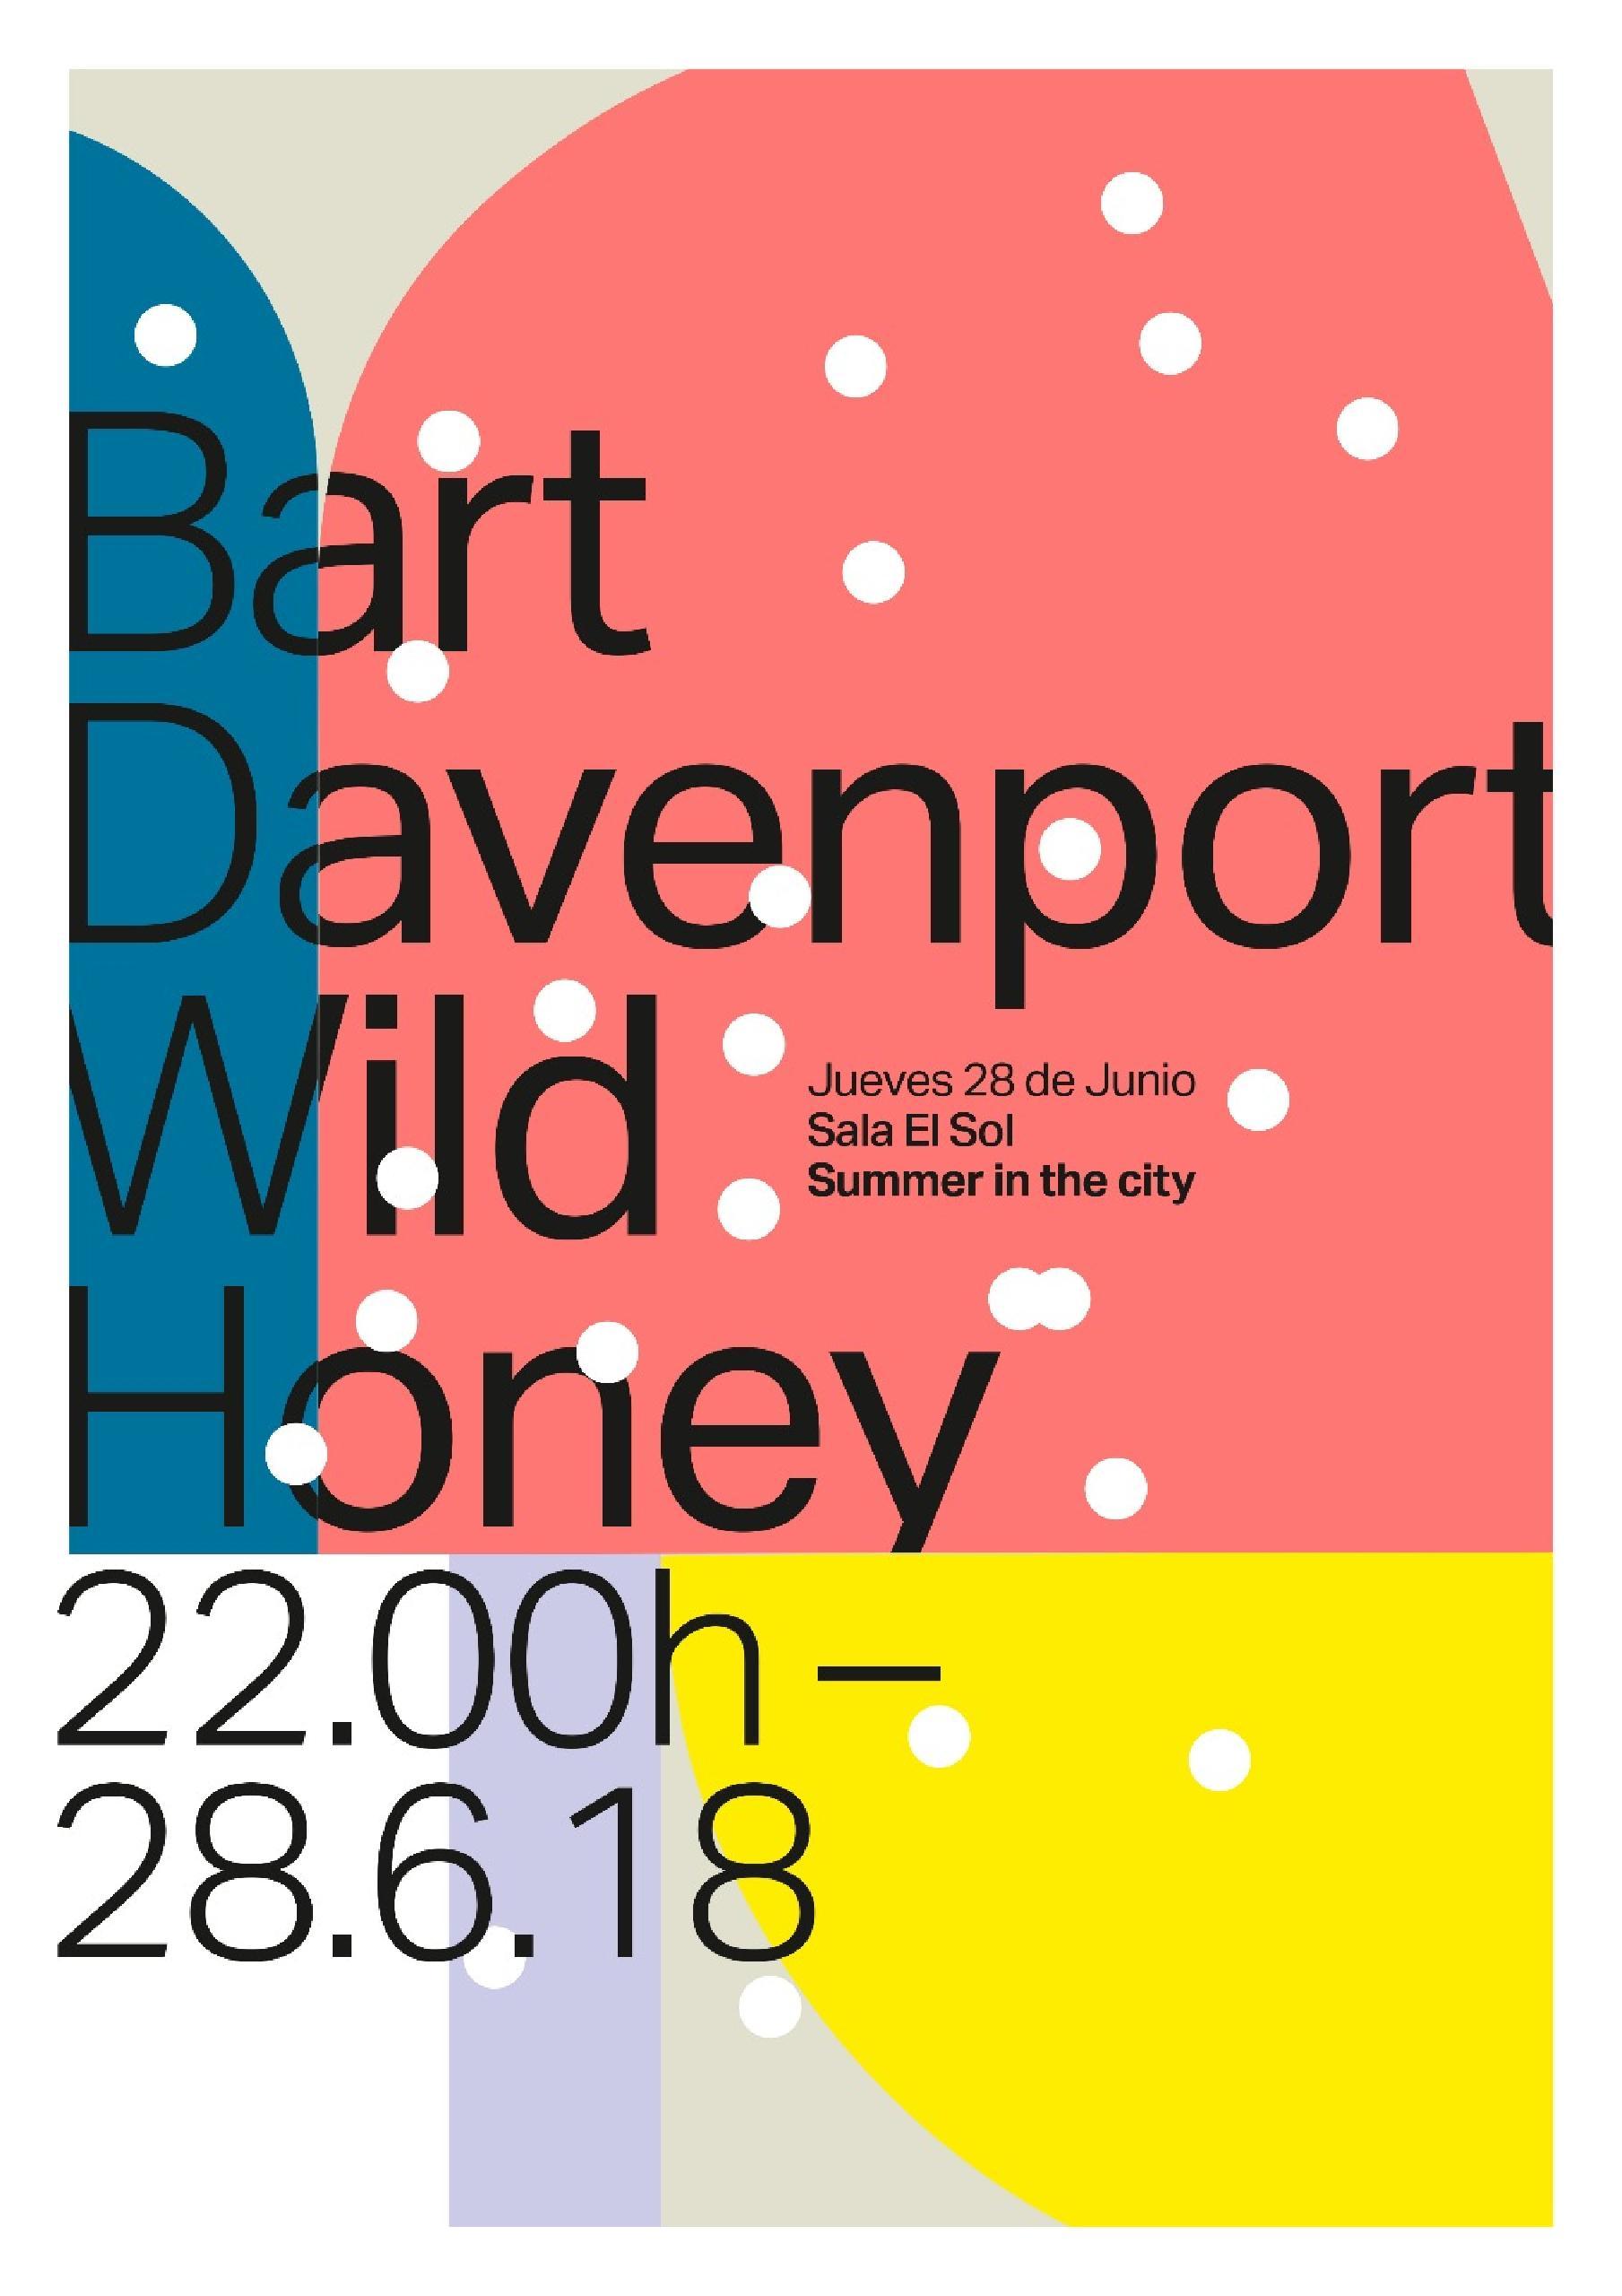 BART DAVENPORT